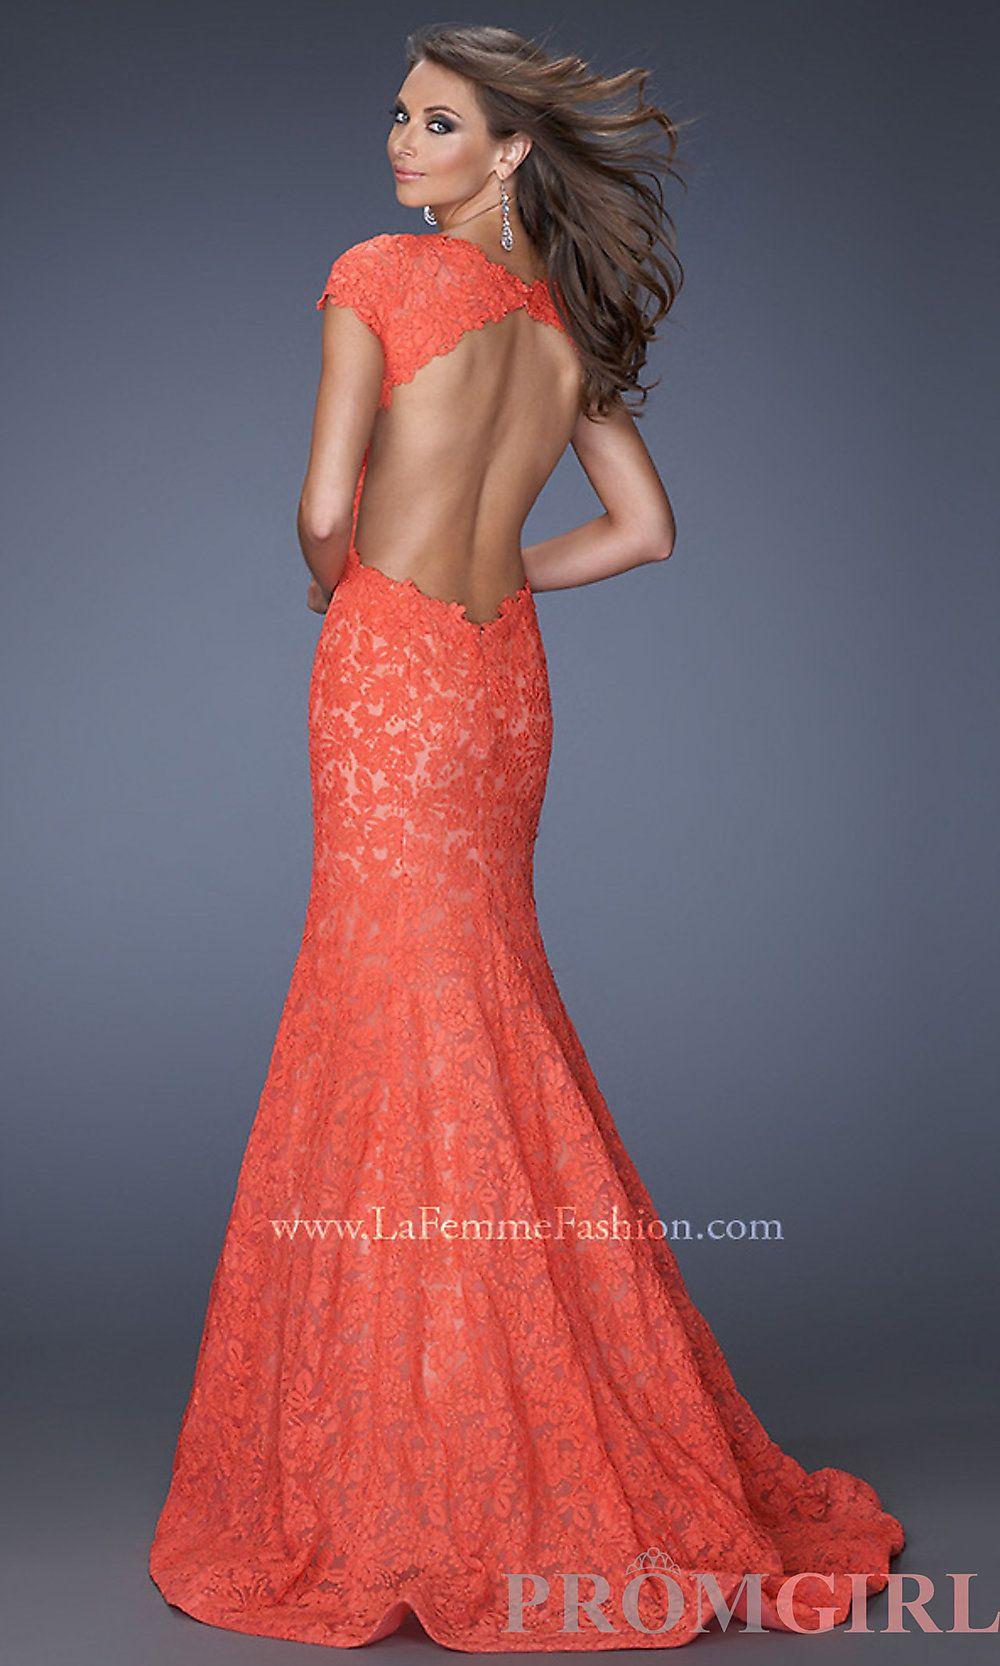 La Femme Prom Dress Red Lace